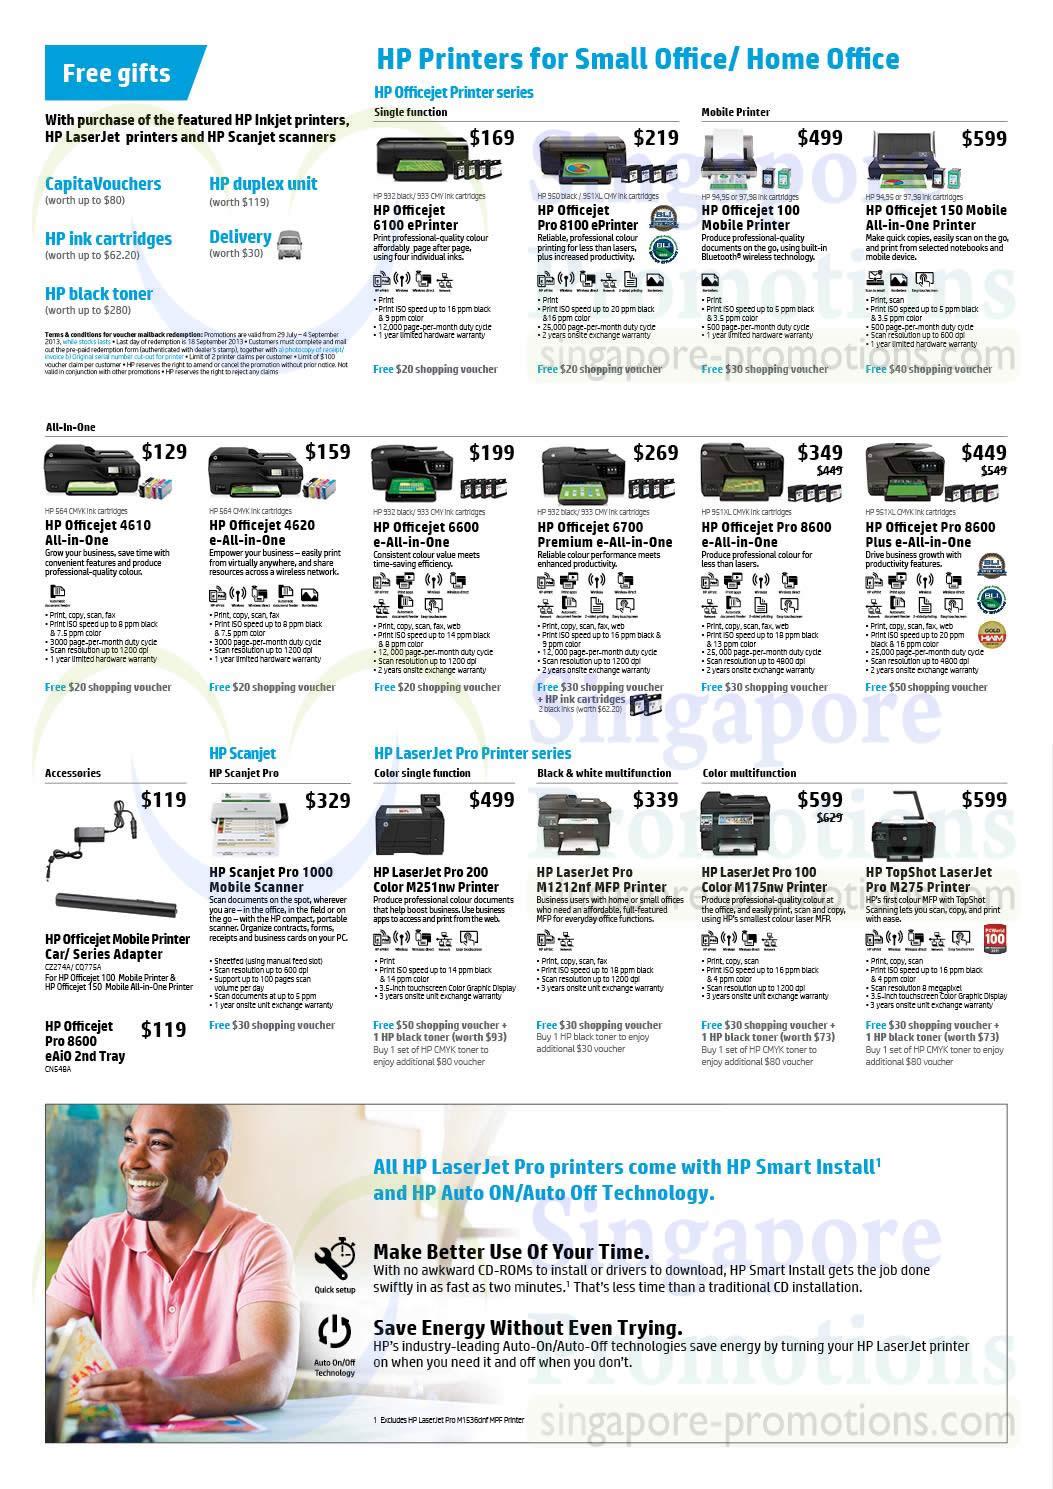 HP 6100 Printer, HP 8100 Printer, HP 100 Printer, HP 150 Printer, HP 4610 Printer, HP 4620 Printer, HP 6600 Printer, HP 6700 Printer, HP 8600 Printer, HP 1000 Scanner, HP 200 Color M251nw Printer, HP M1212nf Printer, HP 100 Color M175nw Printer and HP M275 Printer